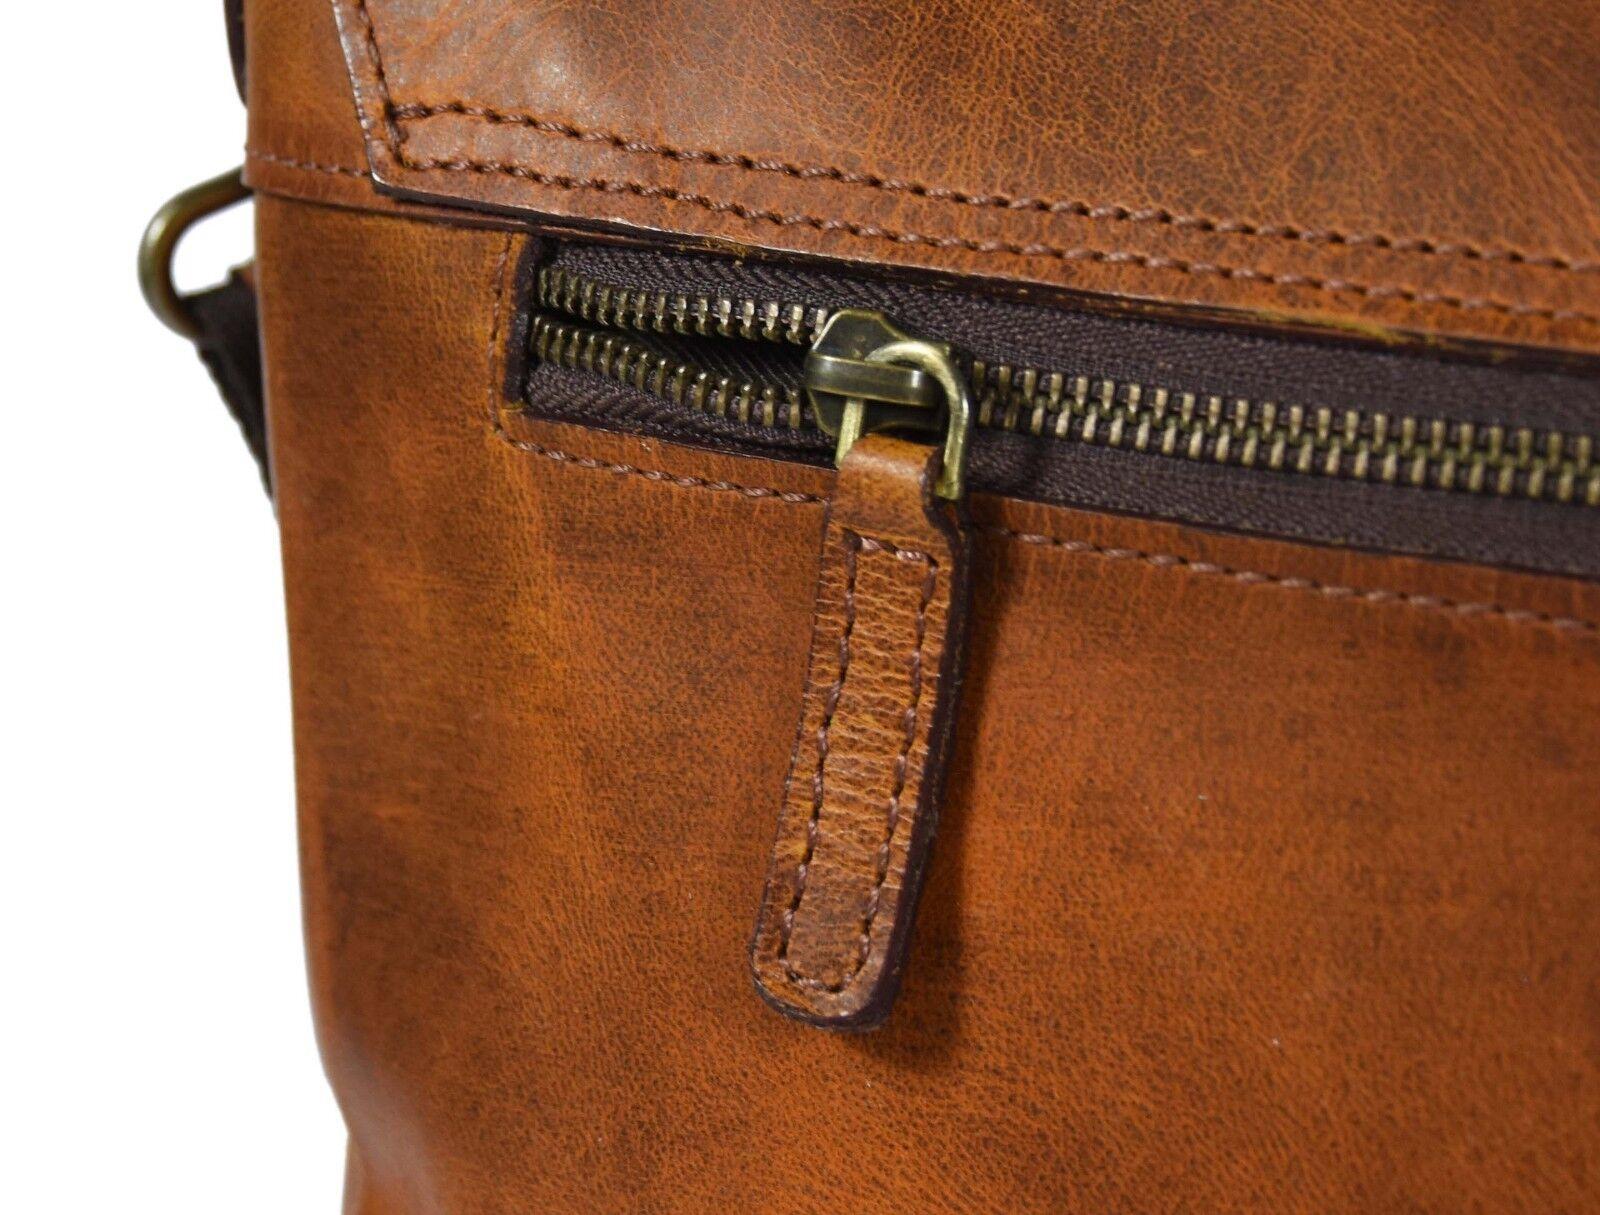 Leder Tasche Umhängetasche 15 Zoll Laptop Schultertasche Messenger Bag Schulranz Schulranz Schulranz   Auktion  3d202b